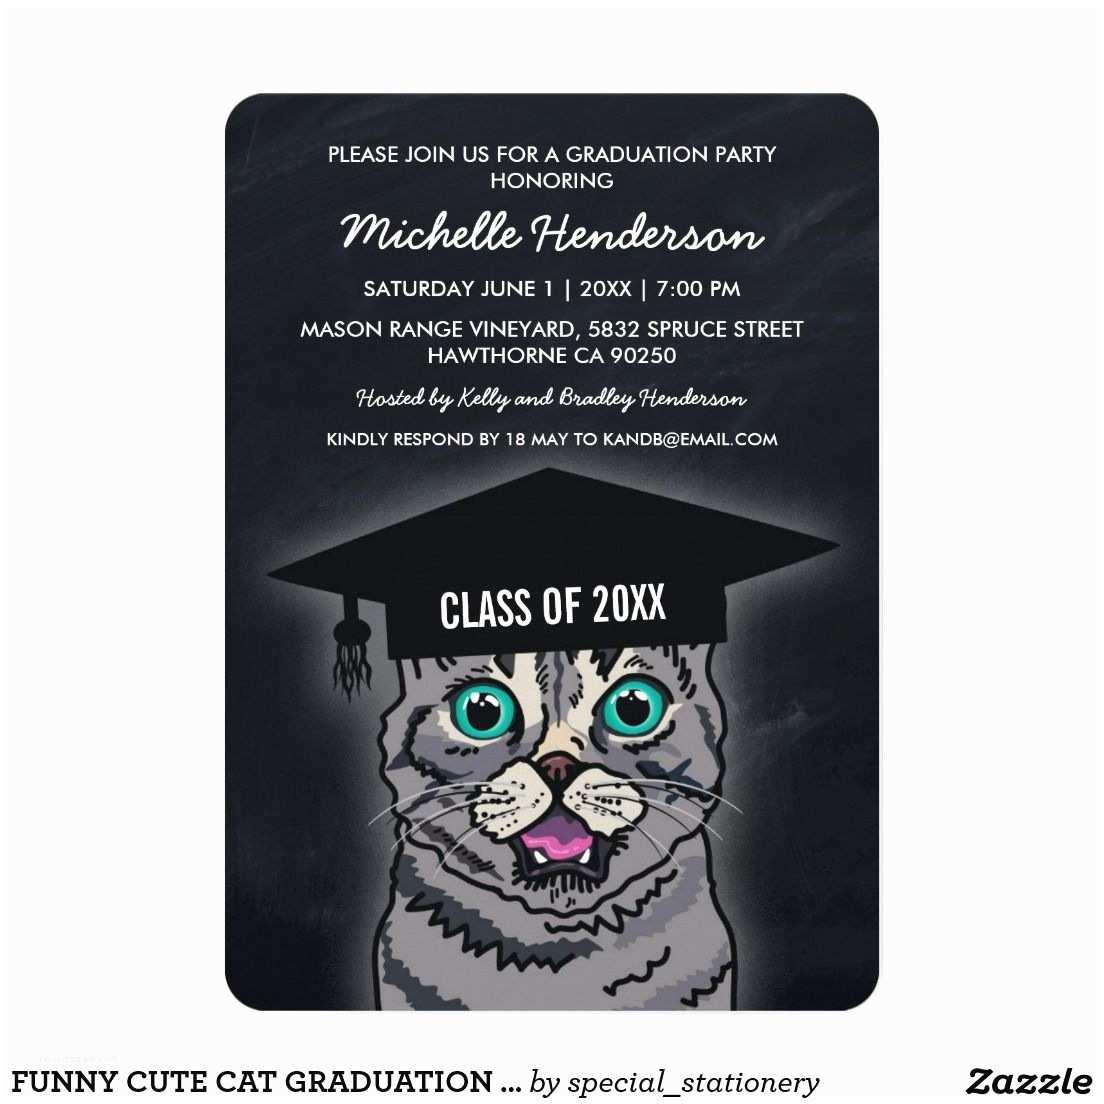 Funny Graduation Invitations Funny Cat Graduation Party Invite